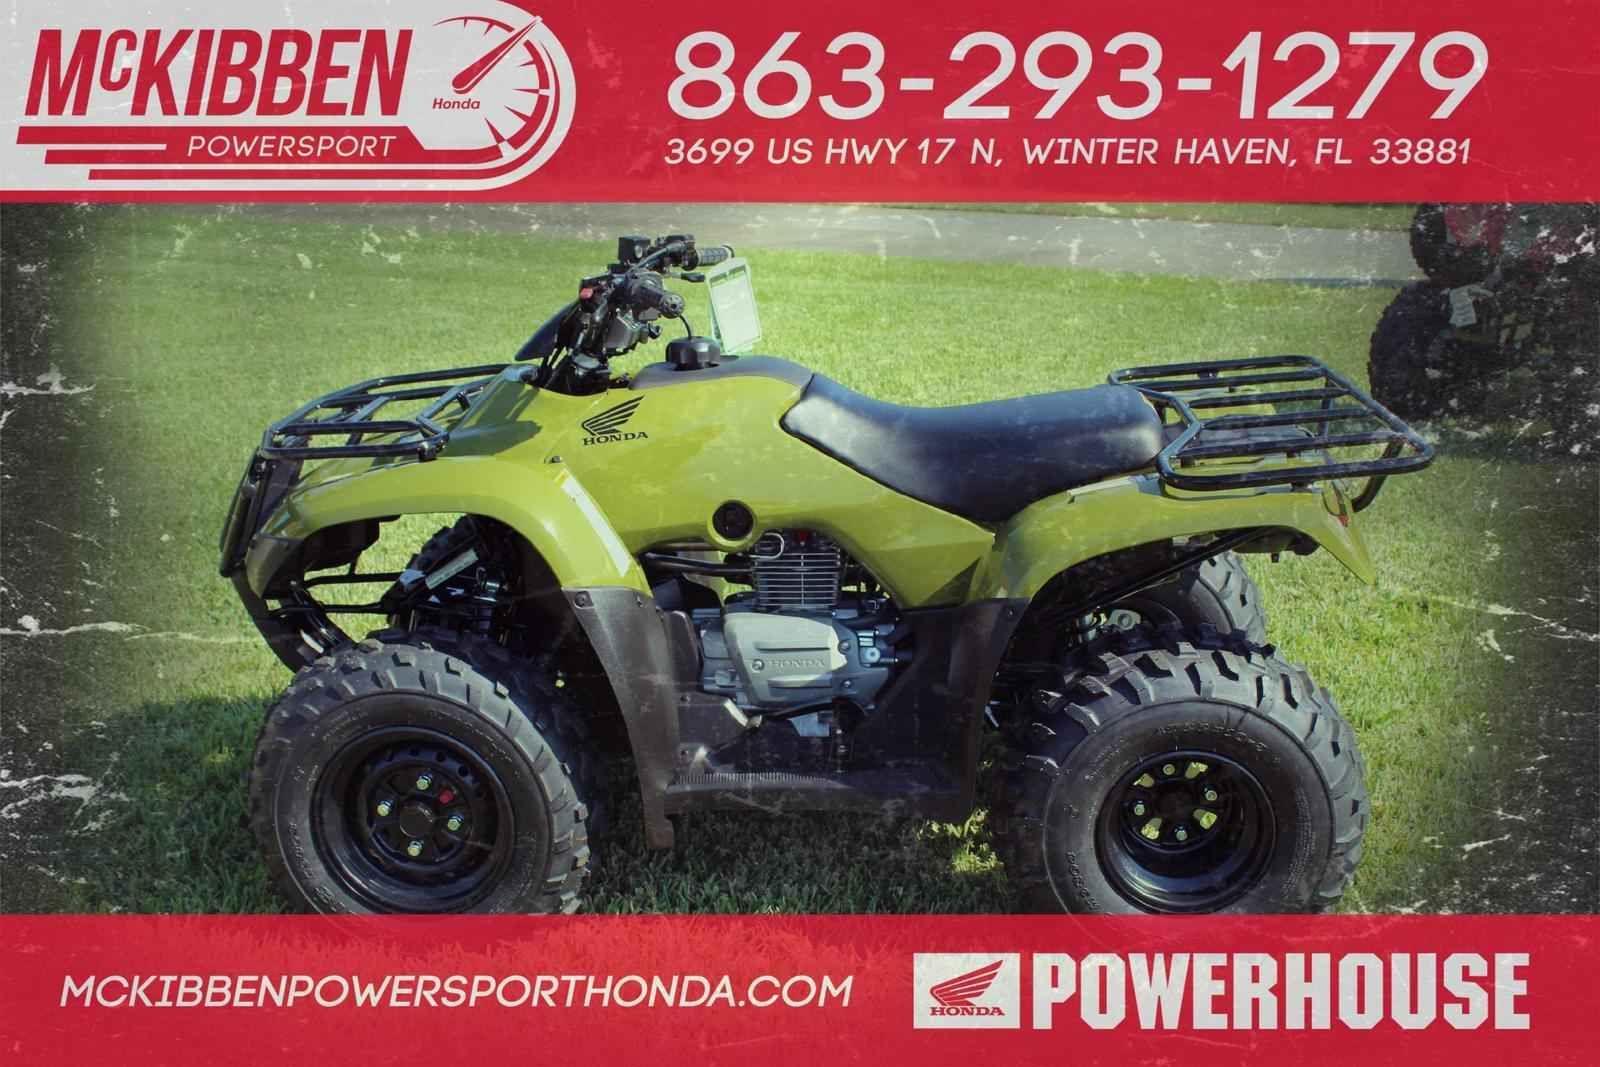 New 2017 Honda FourTrax Recon ATVs For Sale In Florida 2017 HONDA